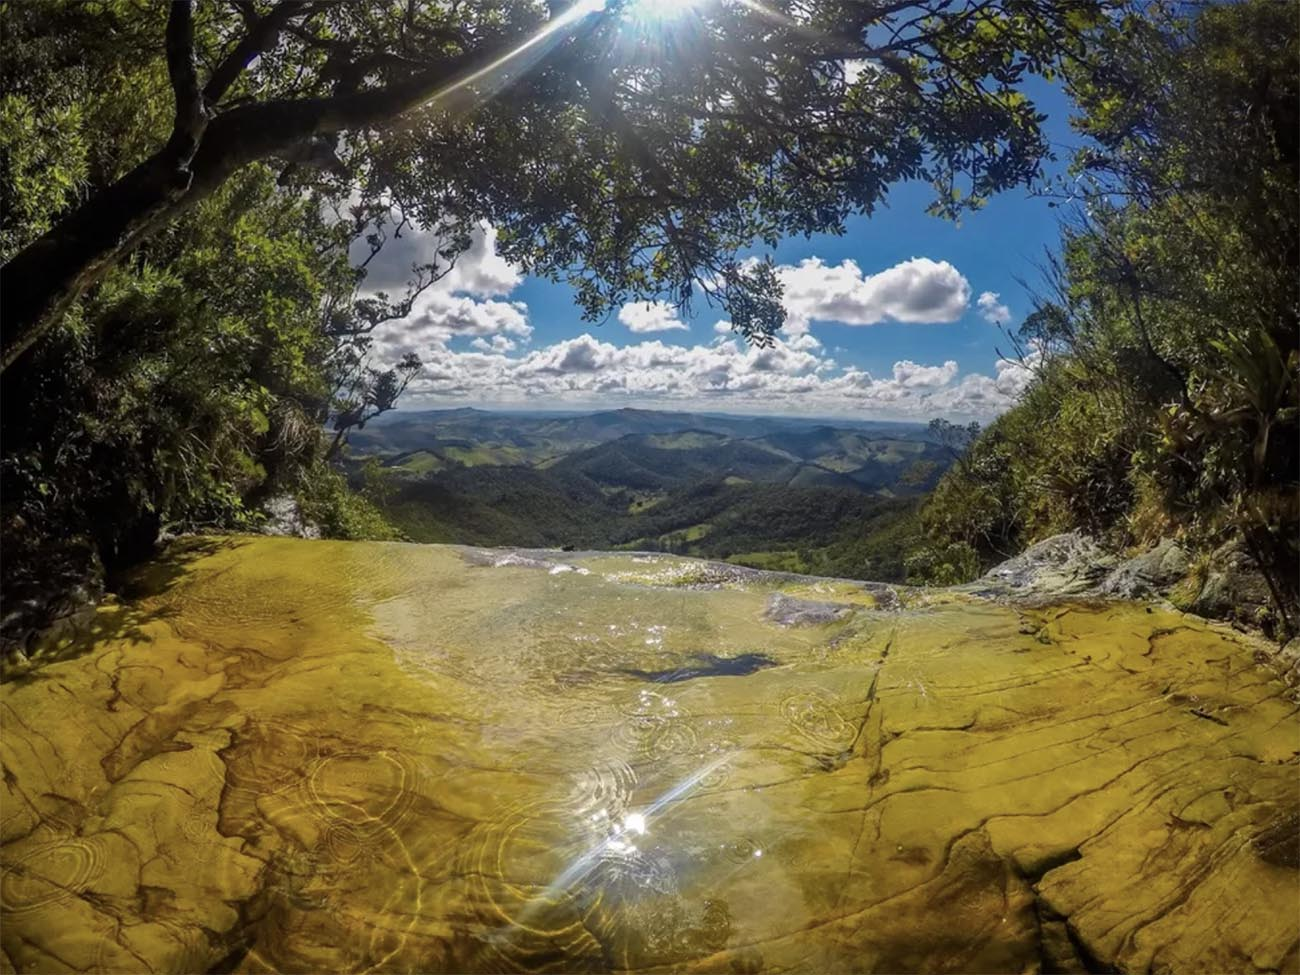 Imagem do parque estadual Ibitipoca